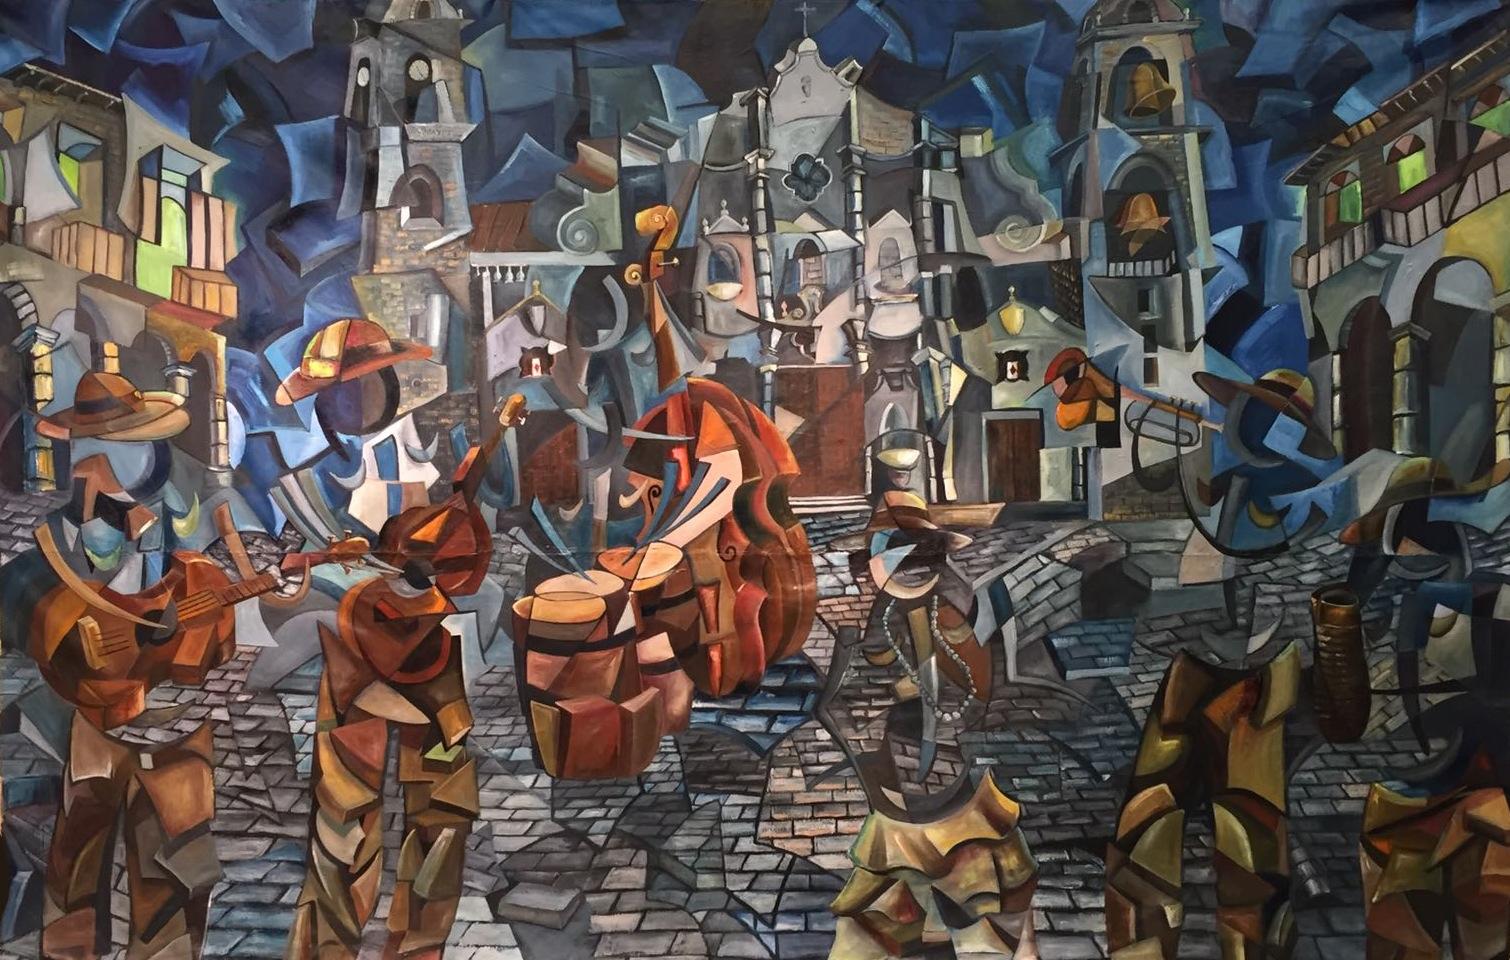 20496922-Leiva,The Celebration, Oil on canvas, 2017, $1,000,000.jpg